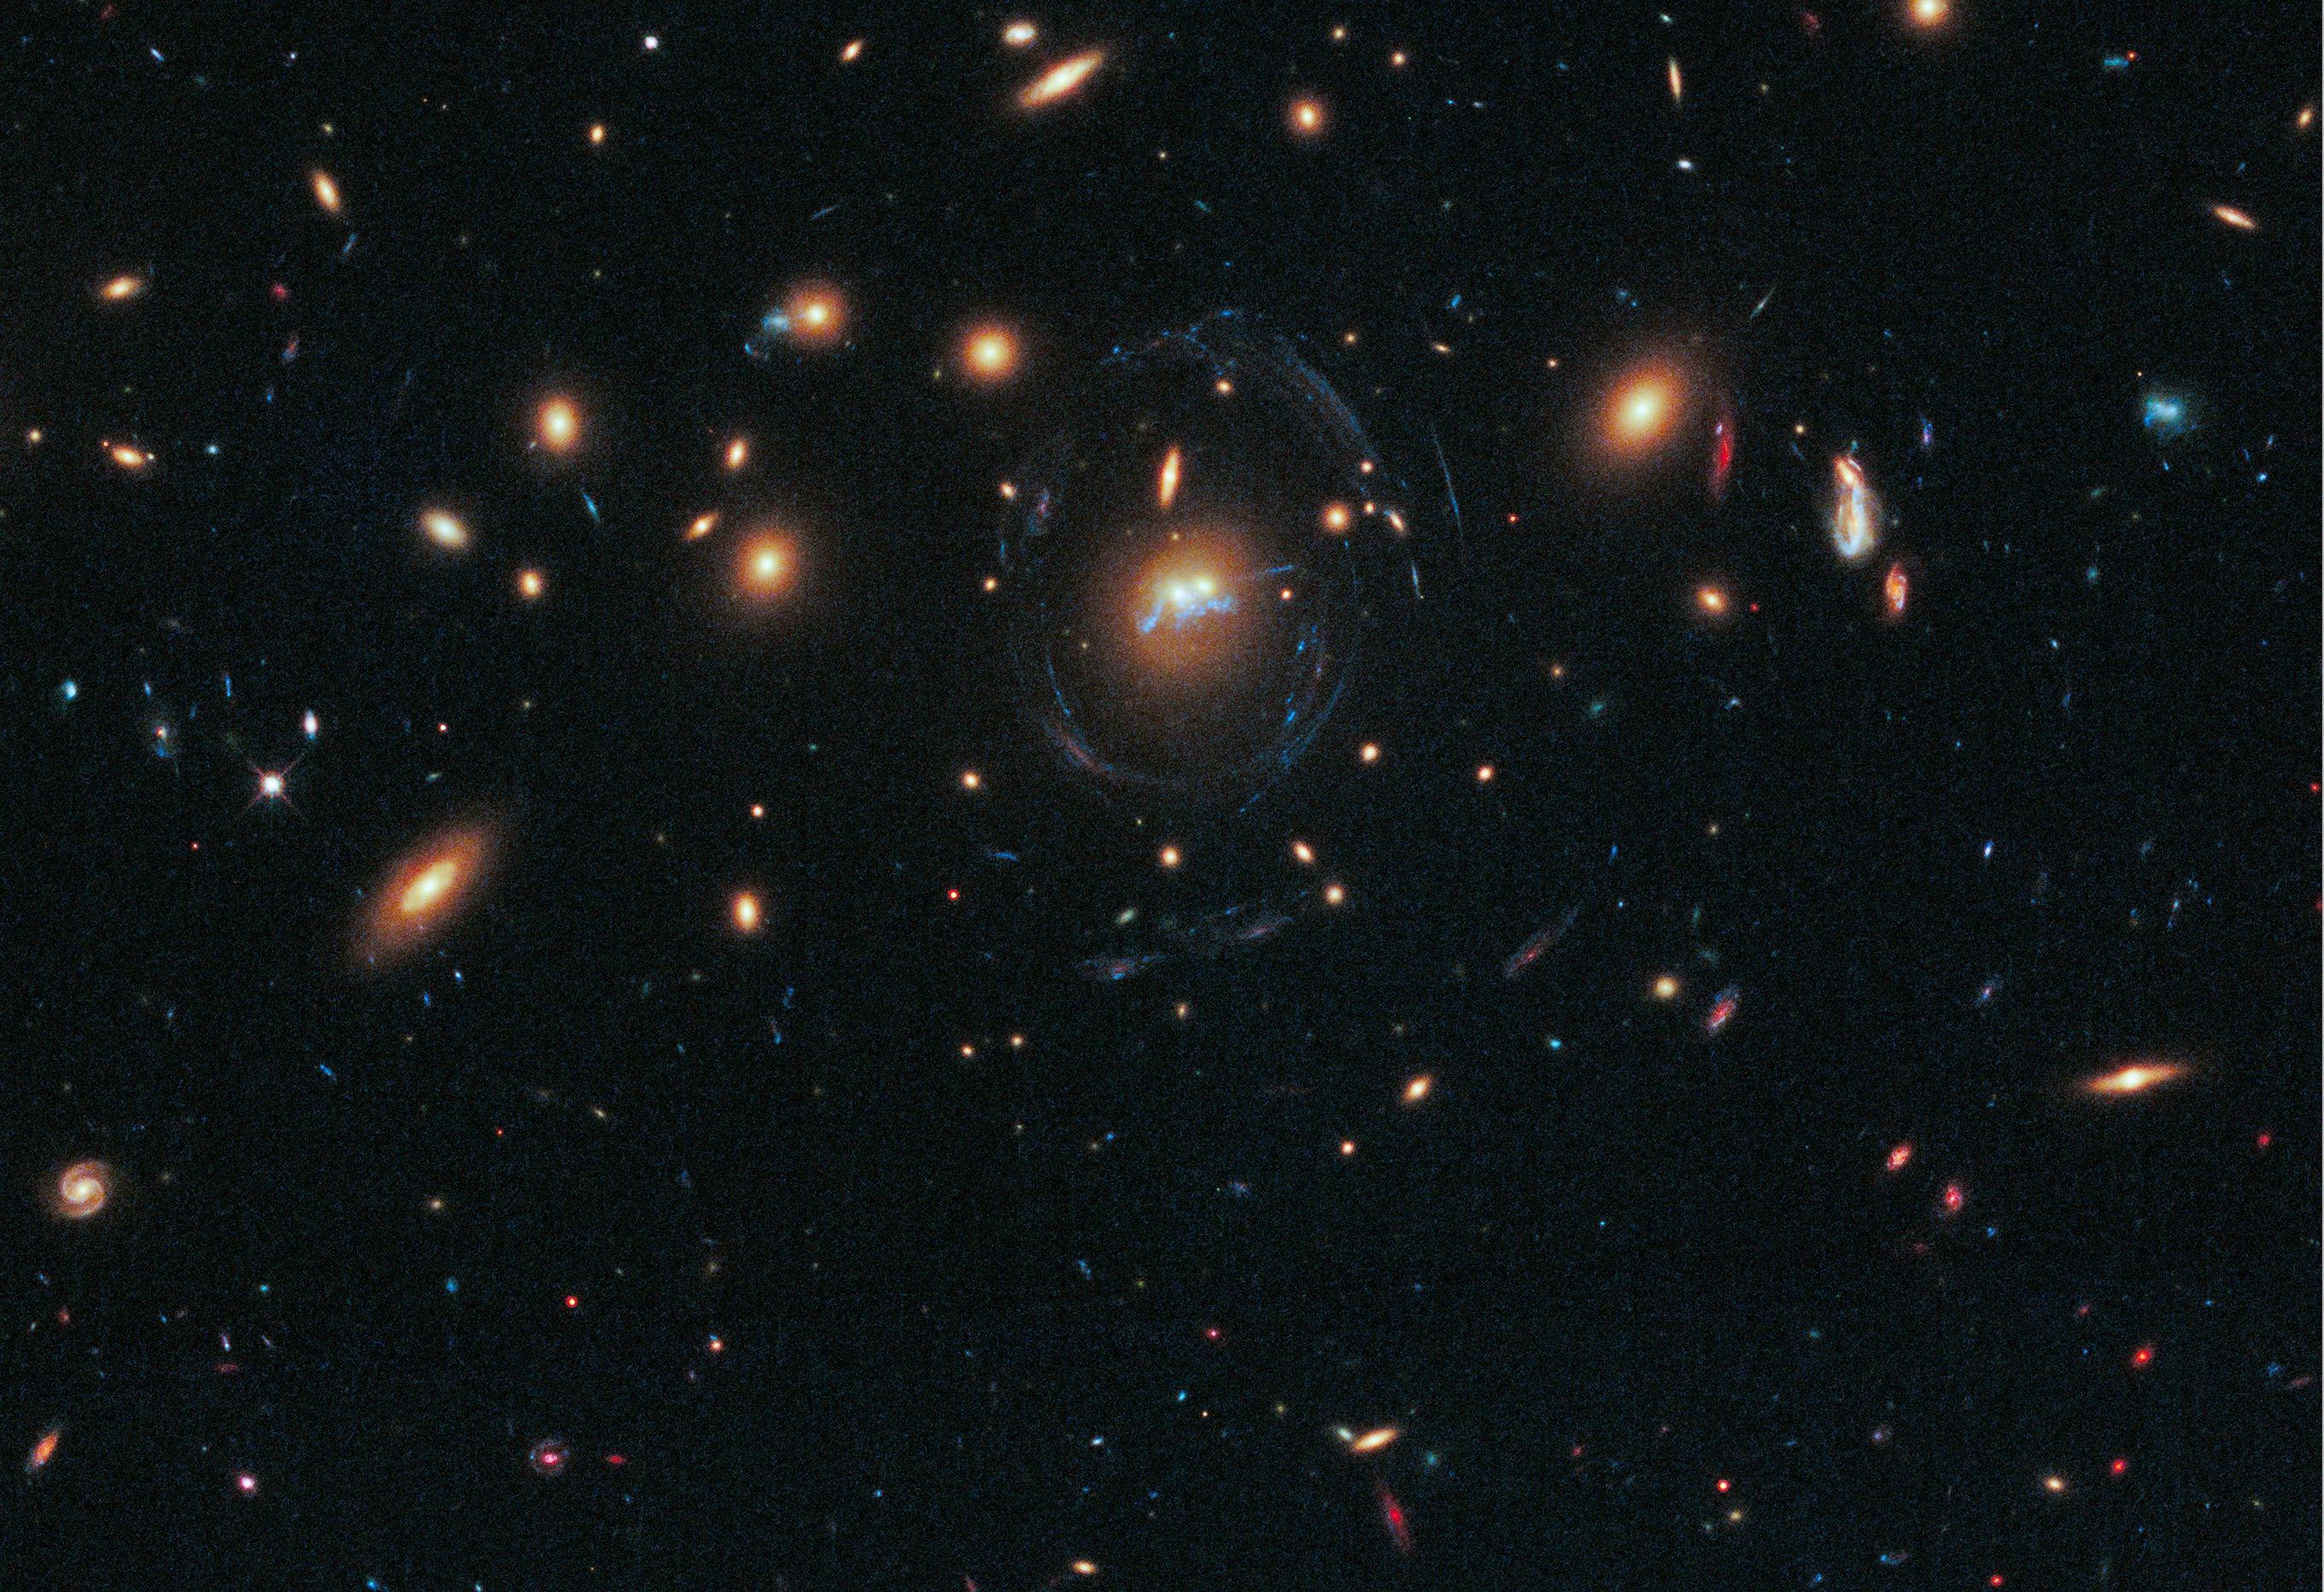 Image: Merging galaxy clusters